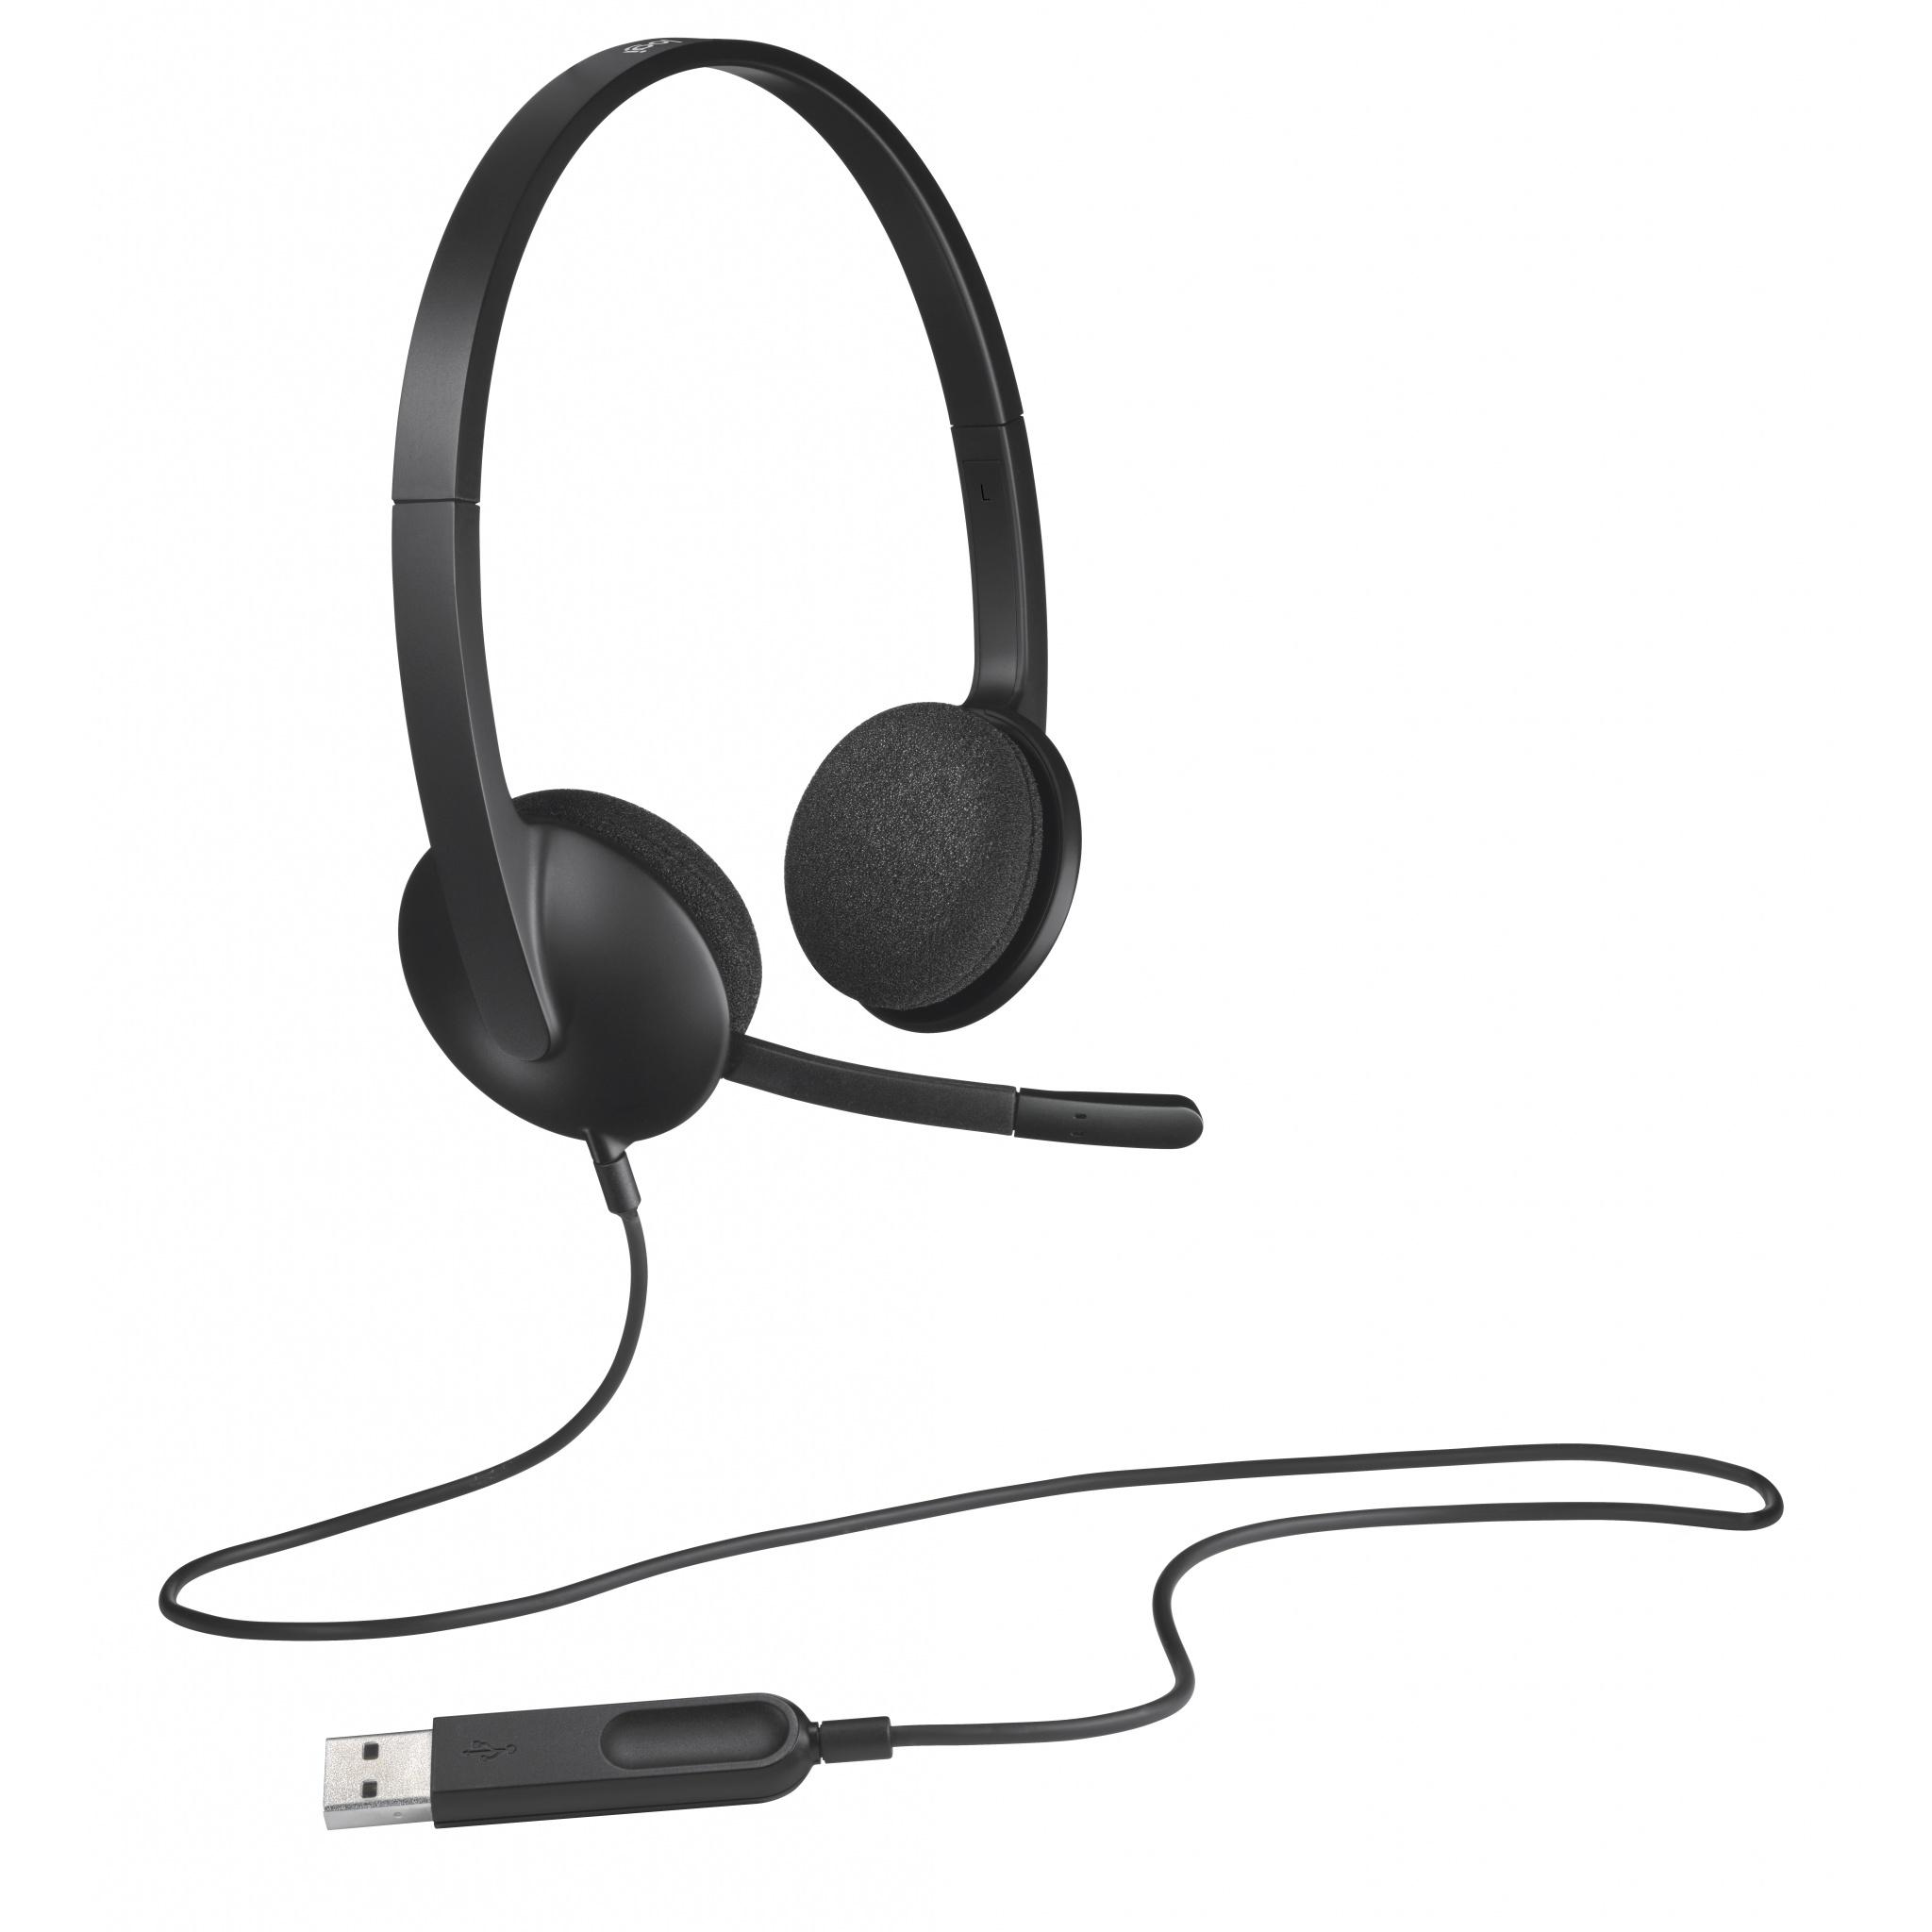 Logitech H340 USB3.0 Binaural filaire casque - noir